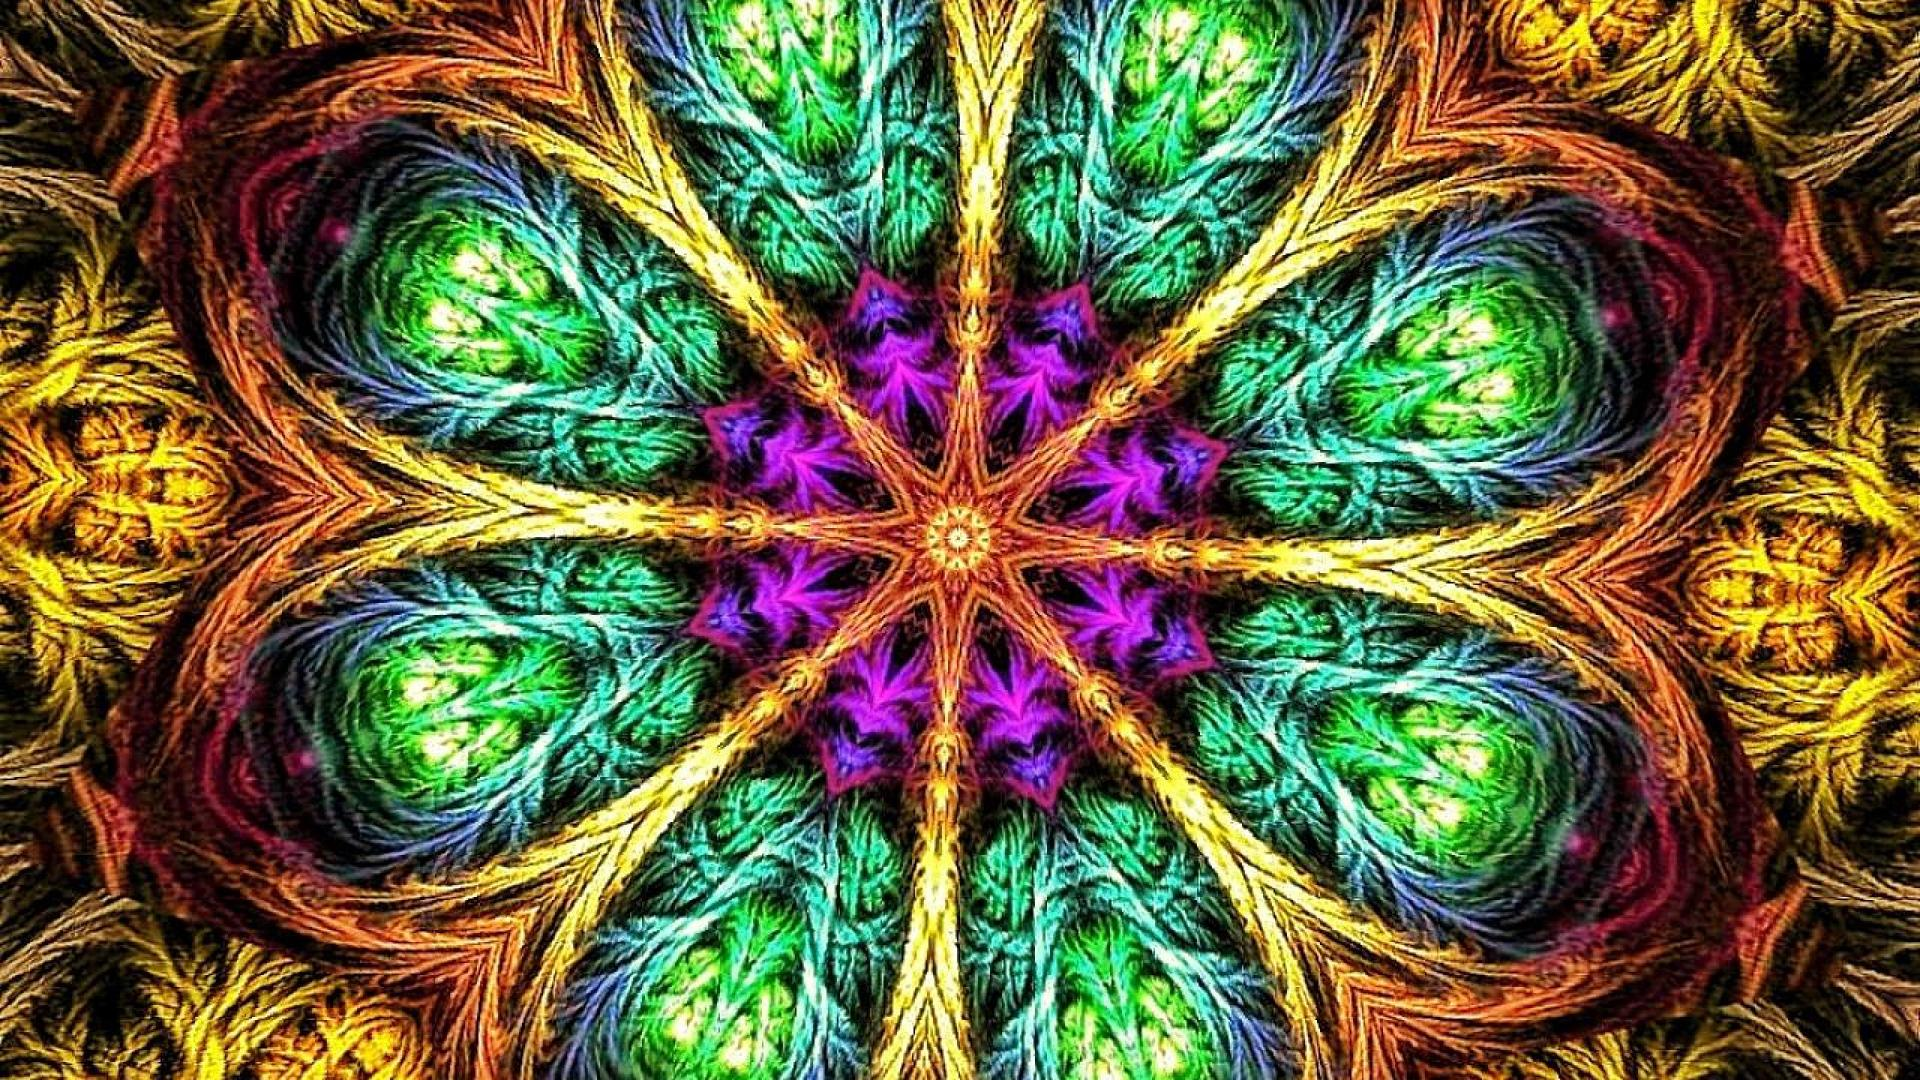 Hd Mandala Wallpaper Wallpapersafari